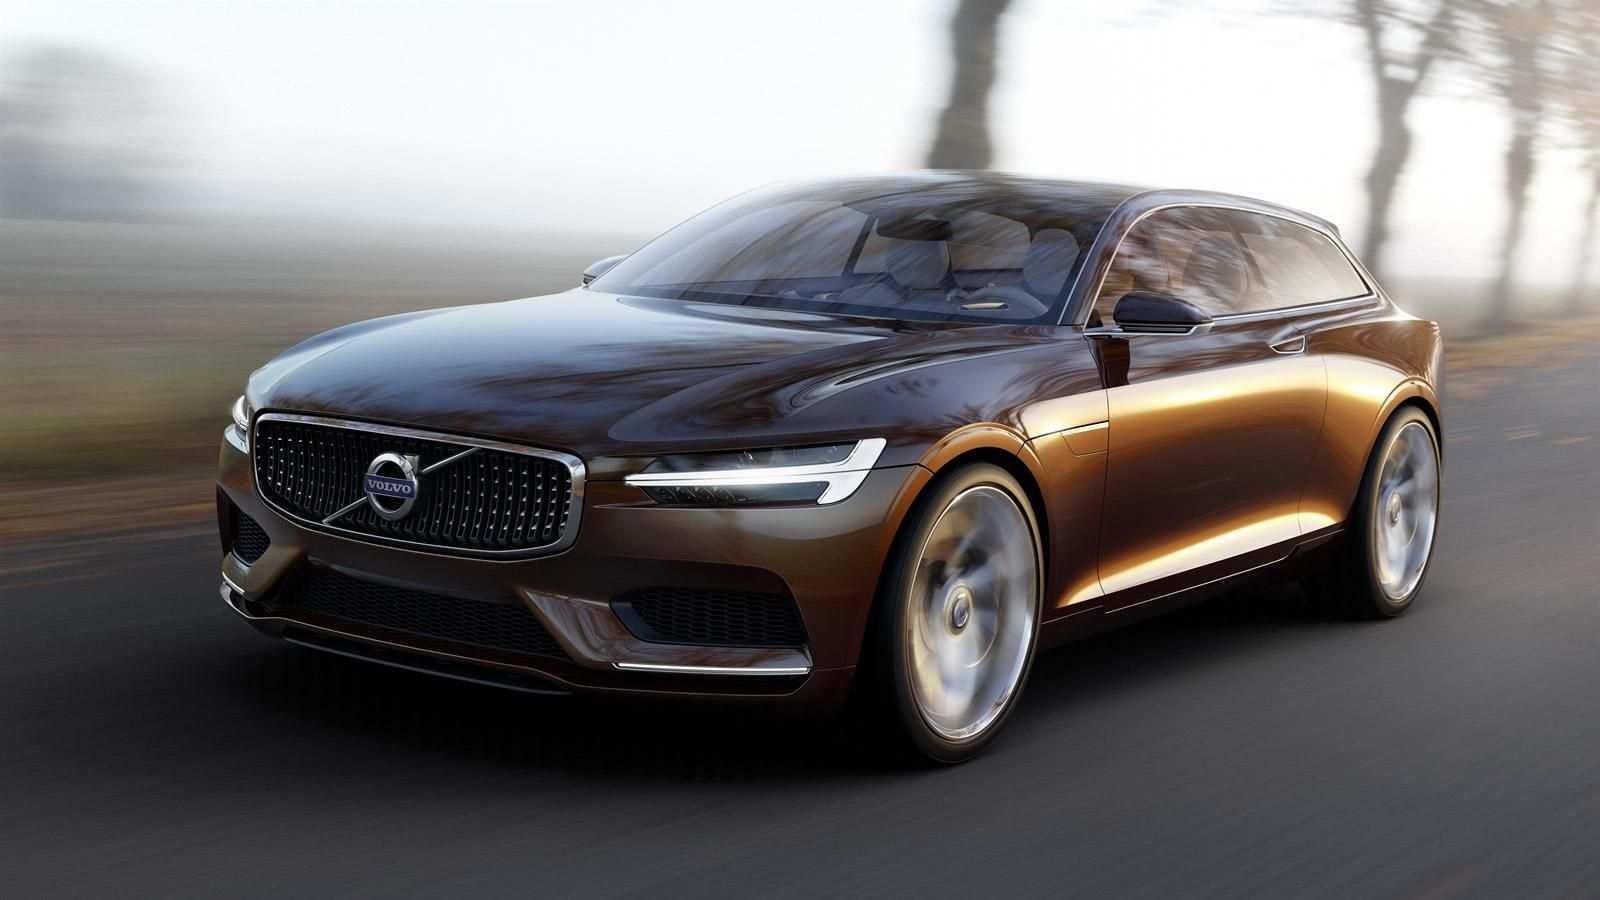 40 The Volvo Open 2020 Model for Volvo Open 2020